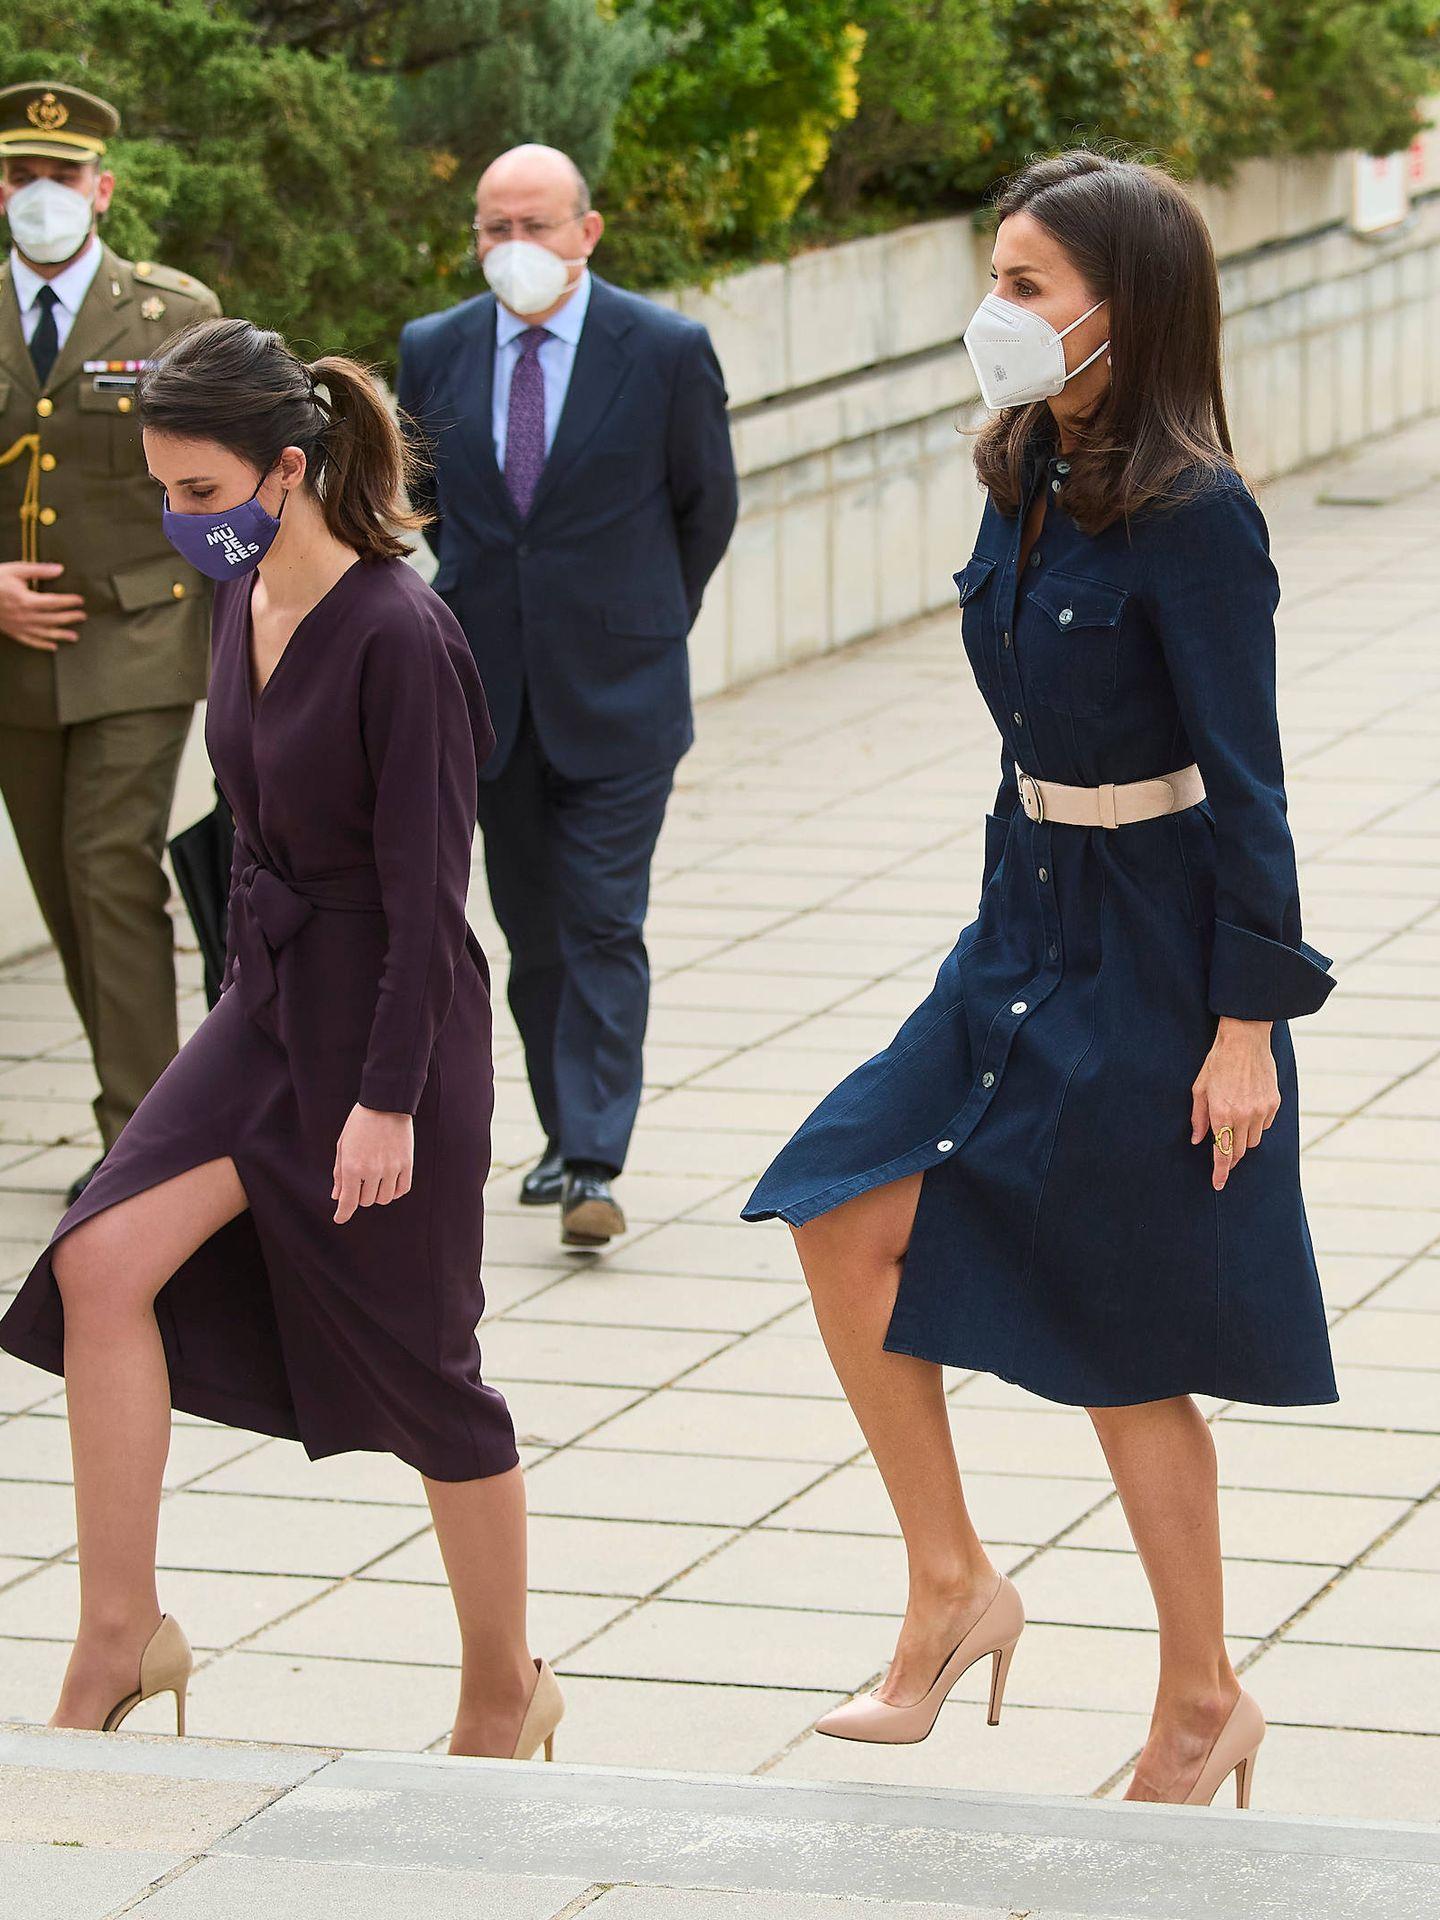 La reina Letizia, junto a Irene Montero el pasado abril. (Limited Pictures)